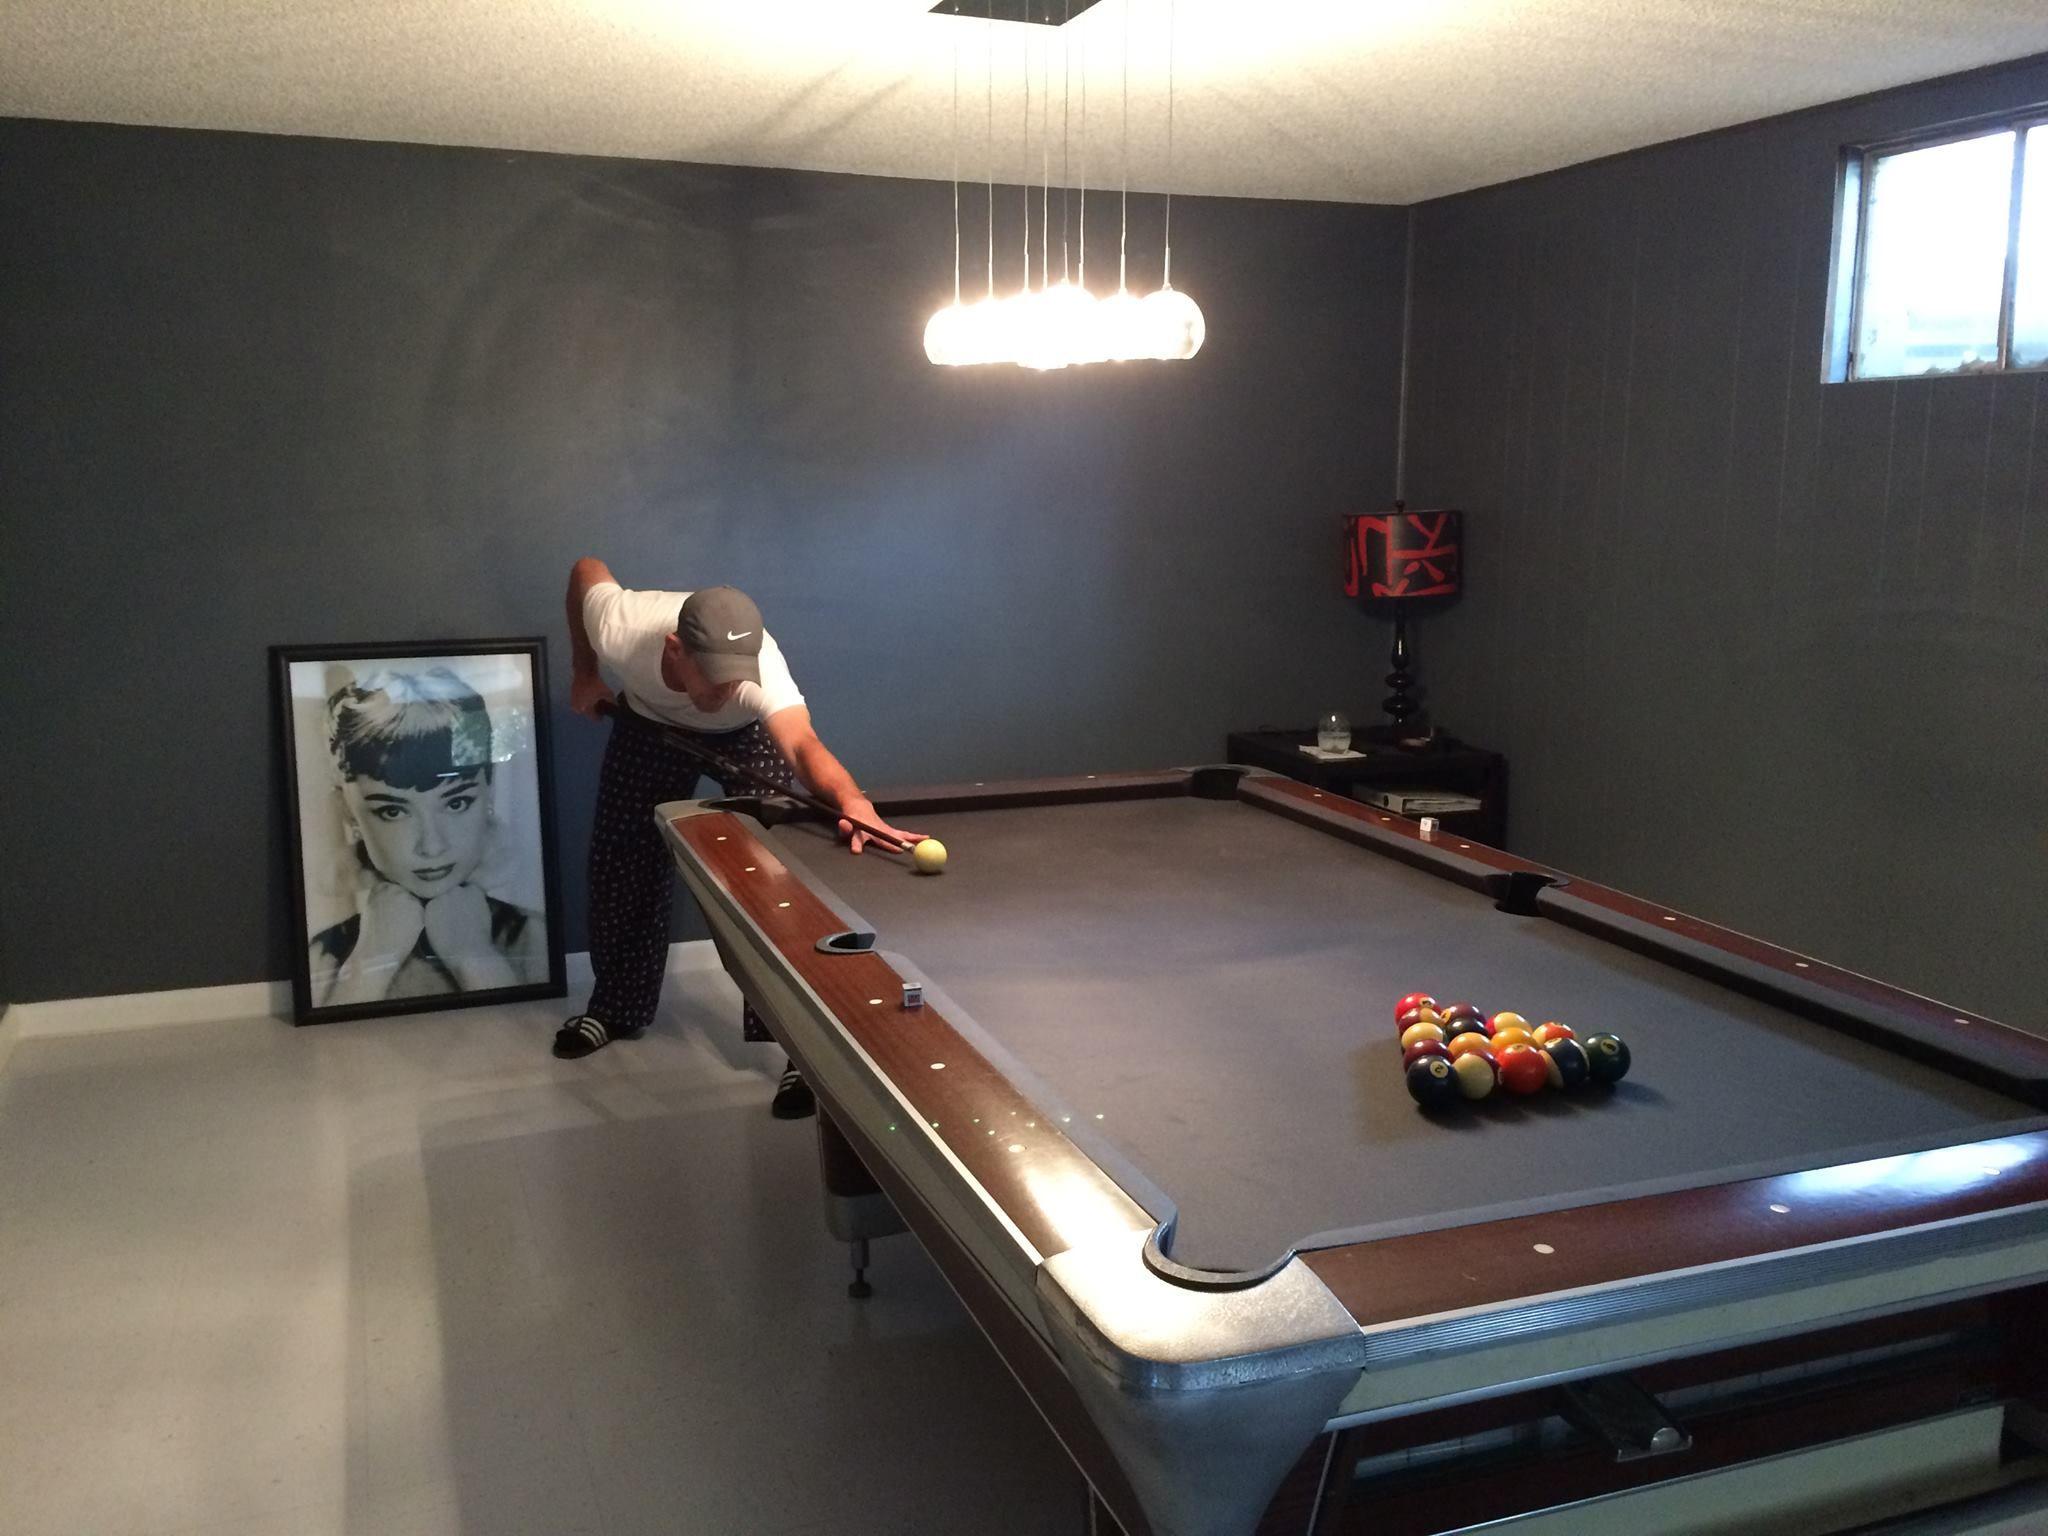 Vintage Fischer Pool Table Garys Swanky Basement Pinterest - Fischer pool table